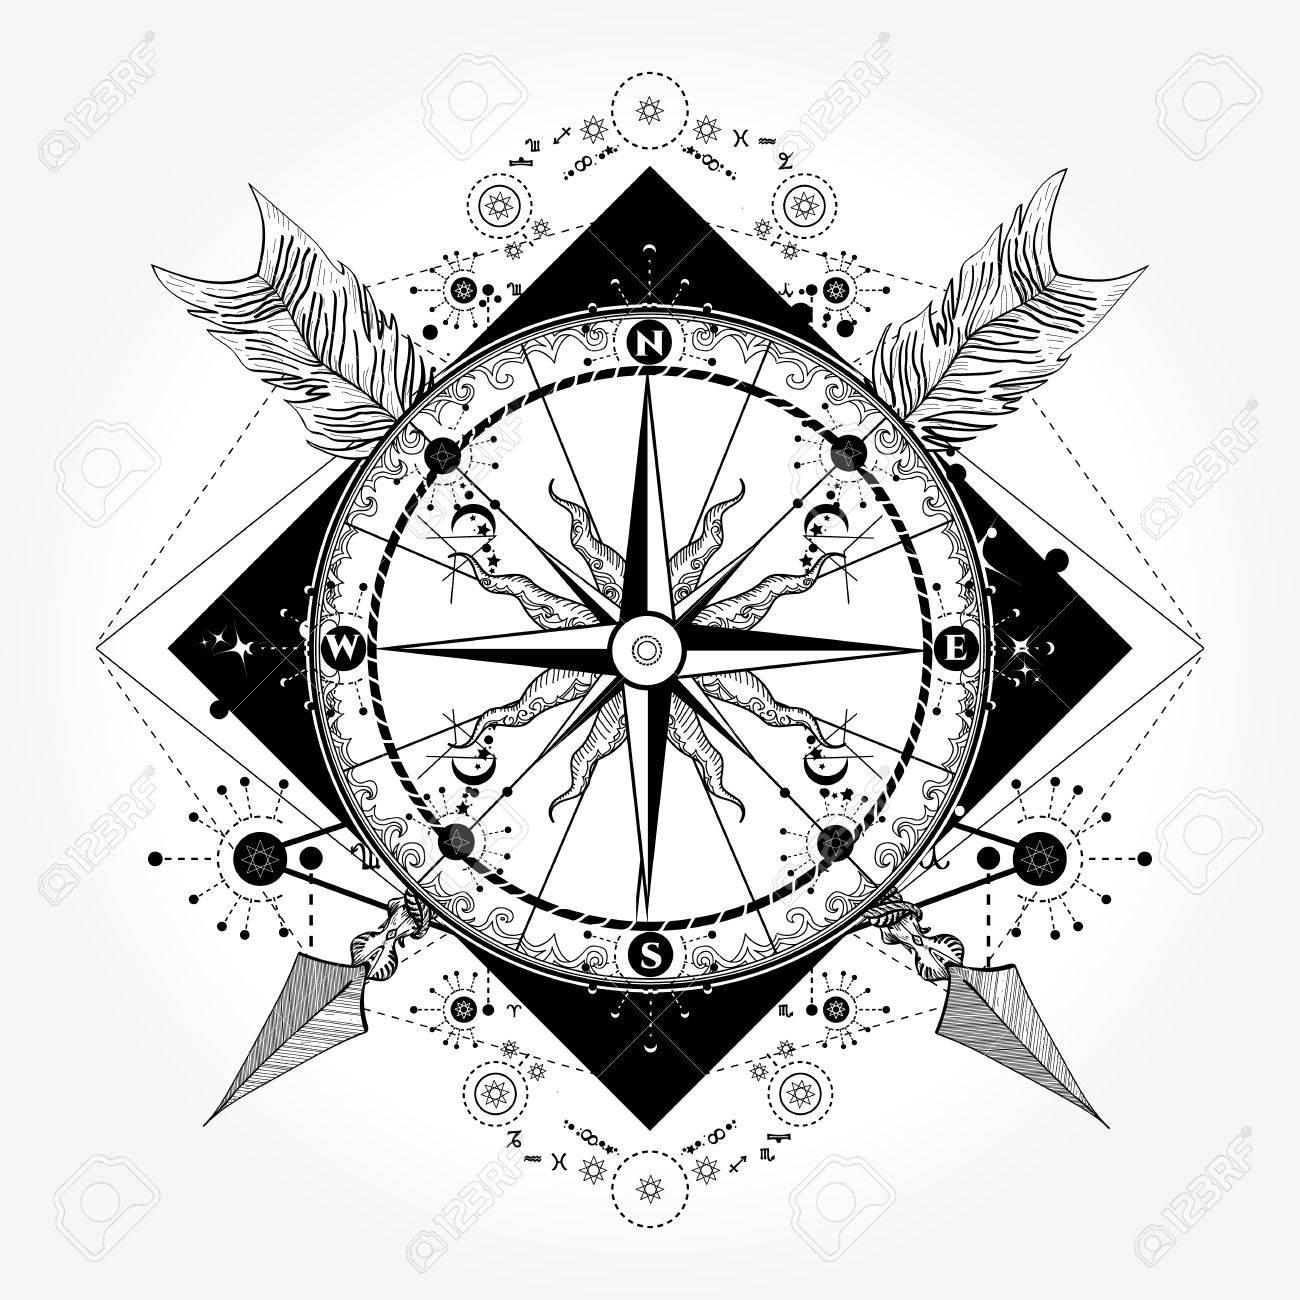 Compass Tattoo Drawing At GetDrawings